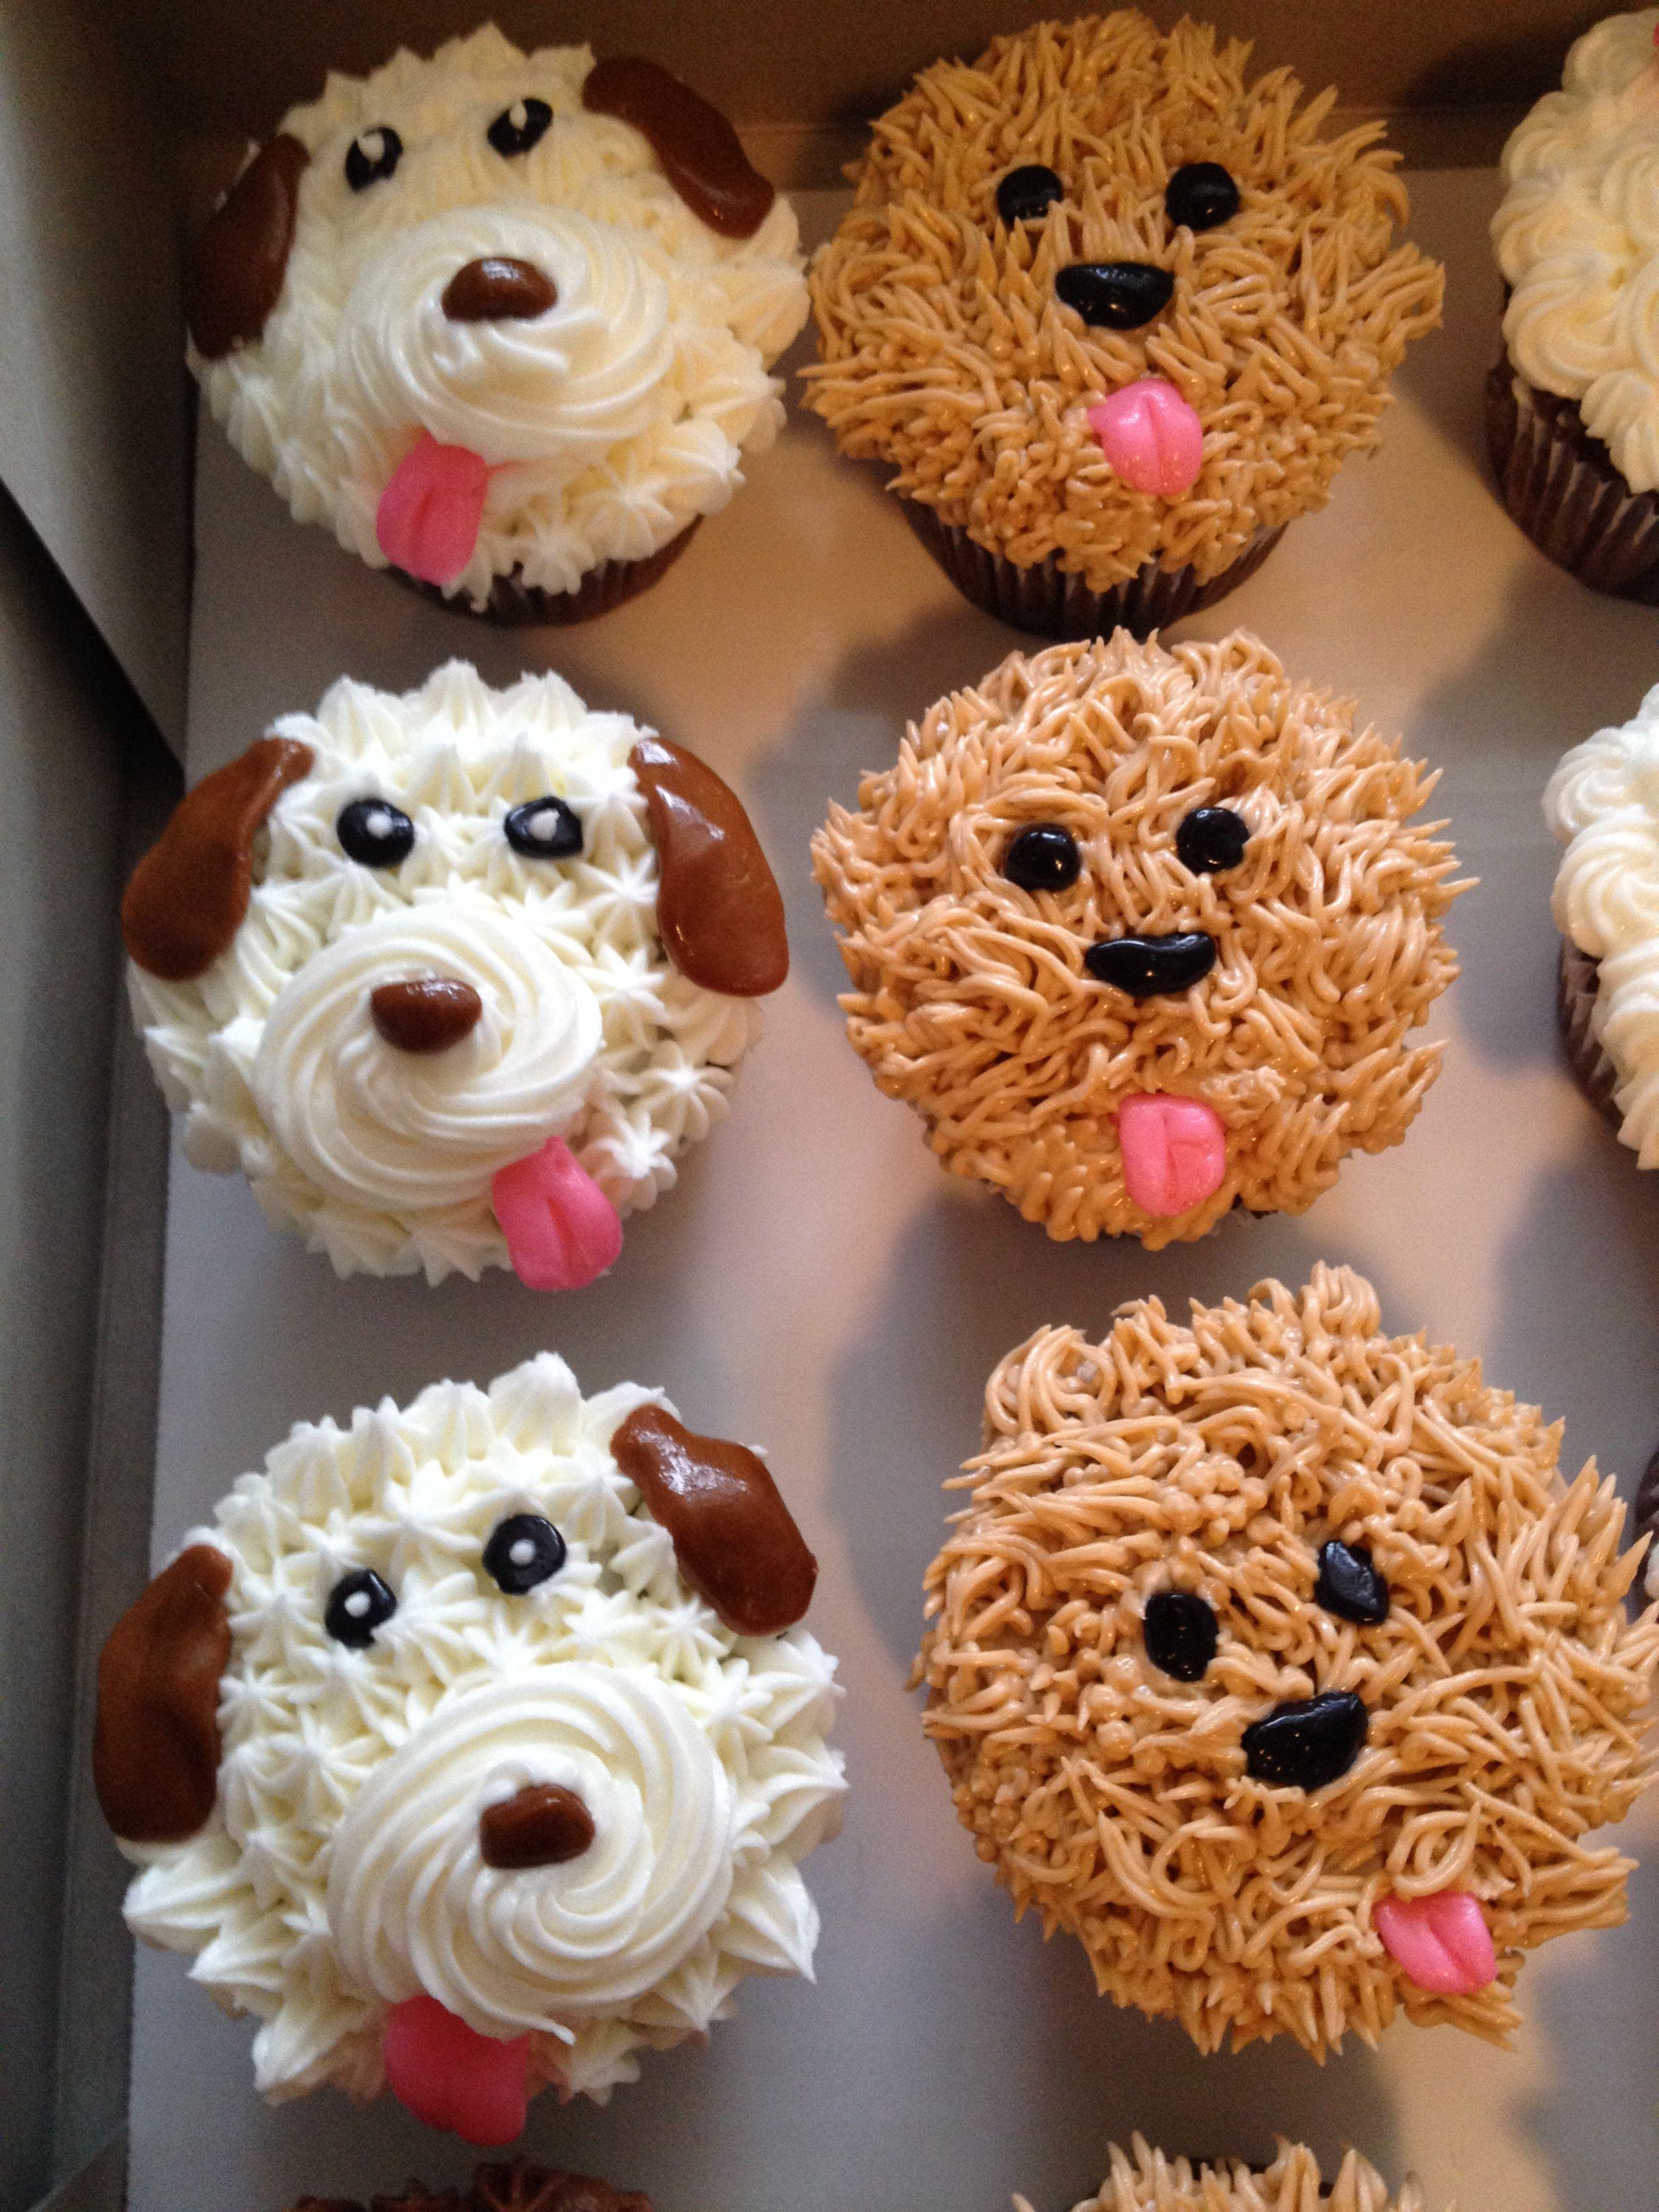 Puppy Cupcakes Crumbs Crumbles Ideas Torta De Dulces Cupcakes